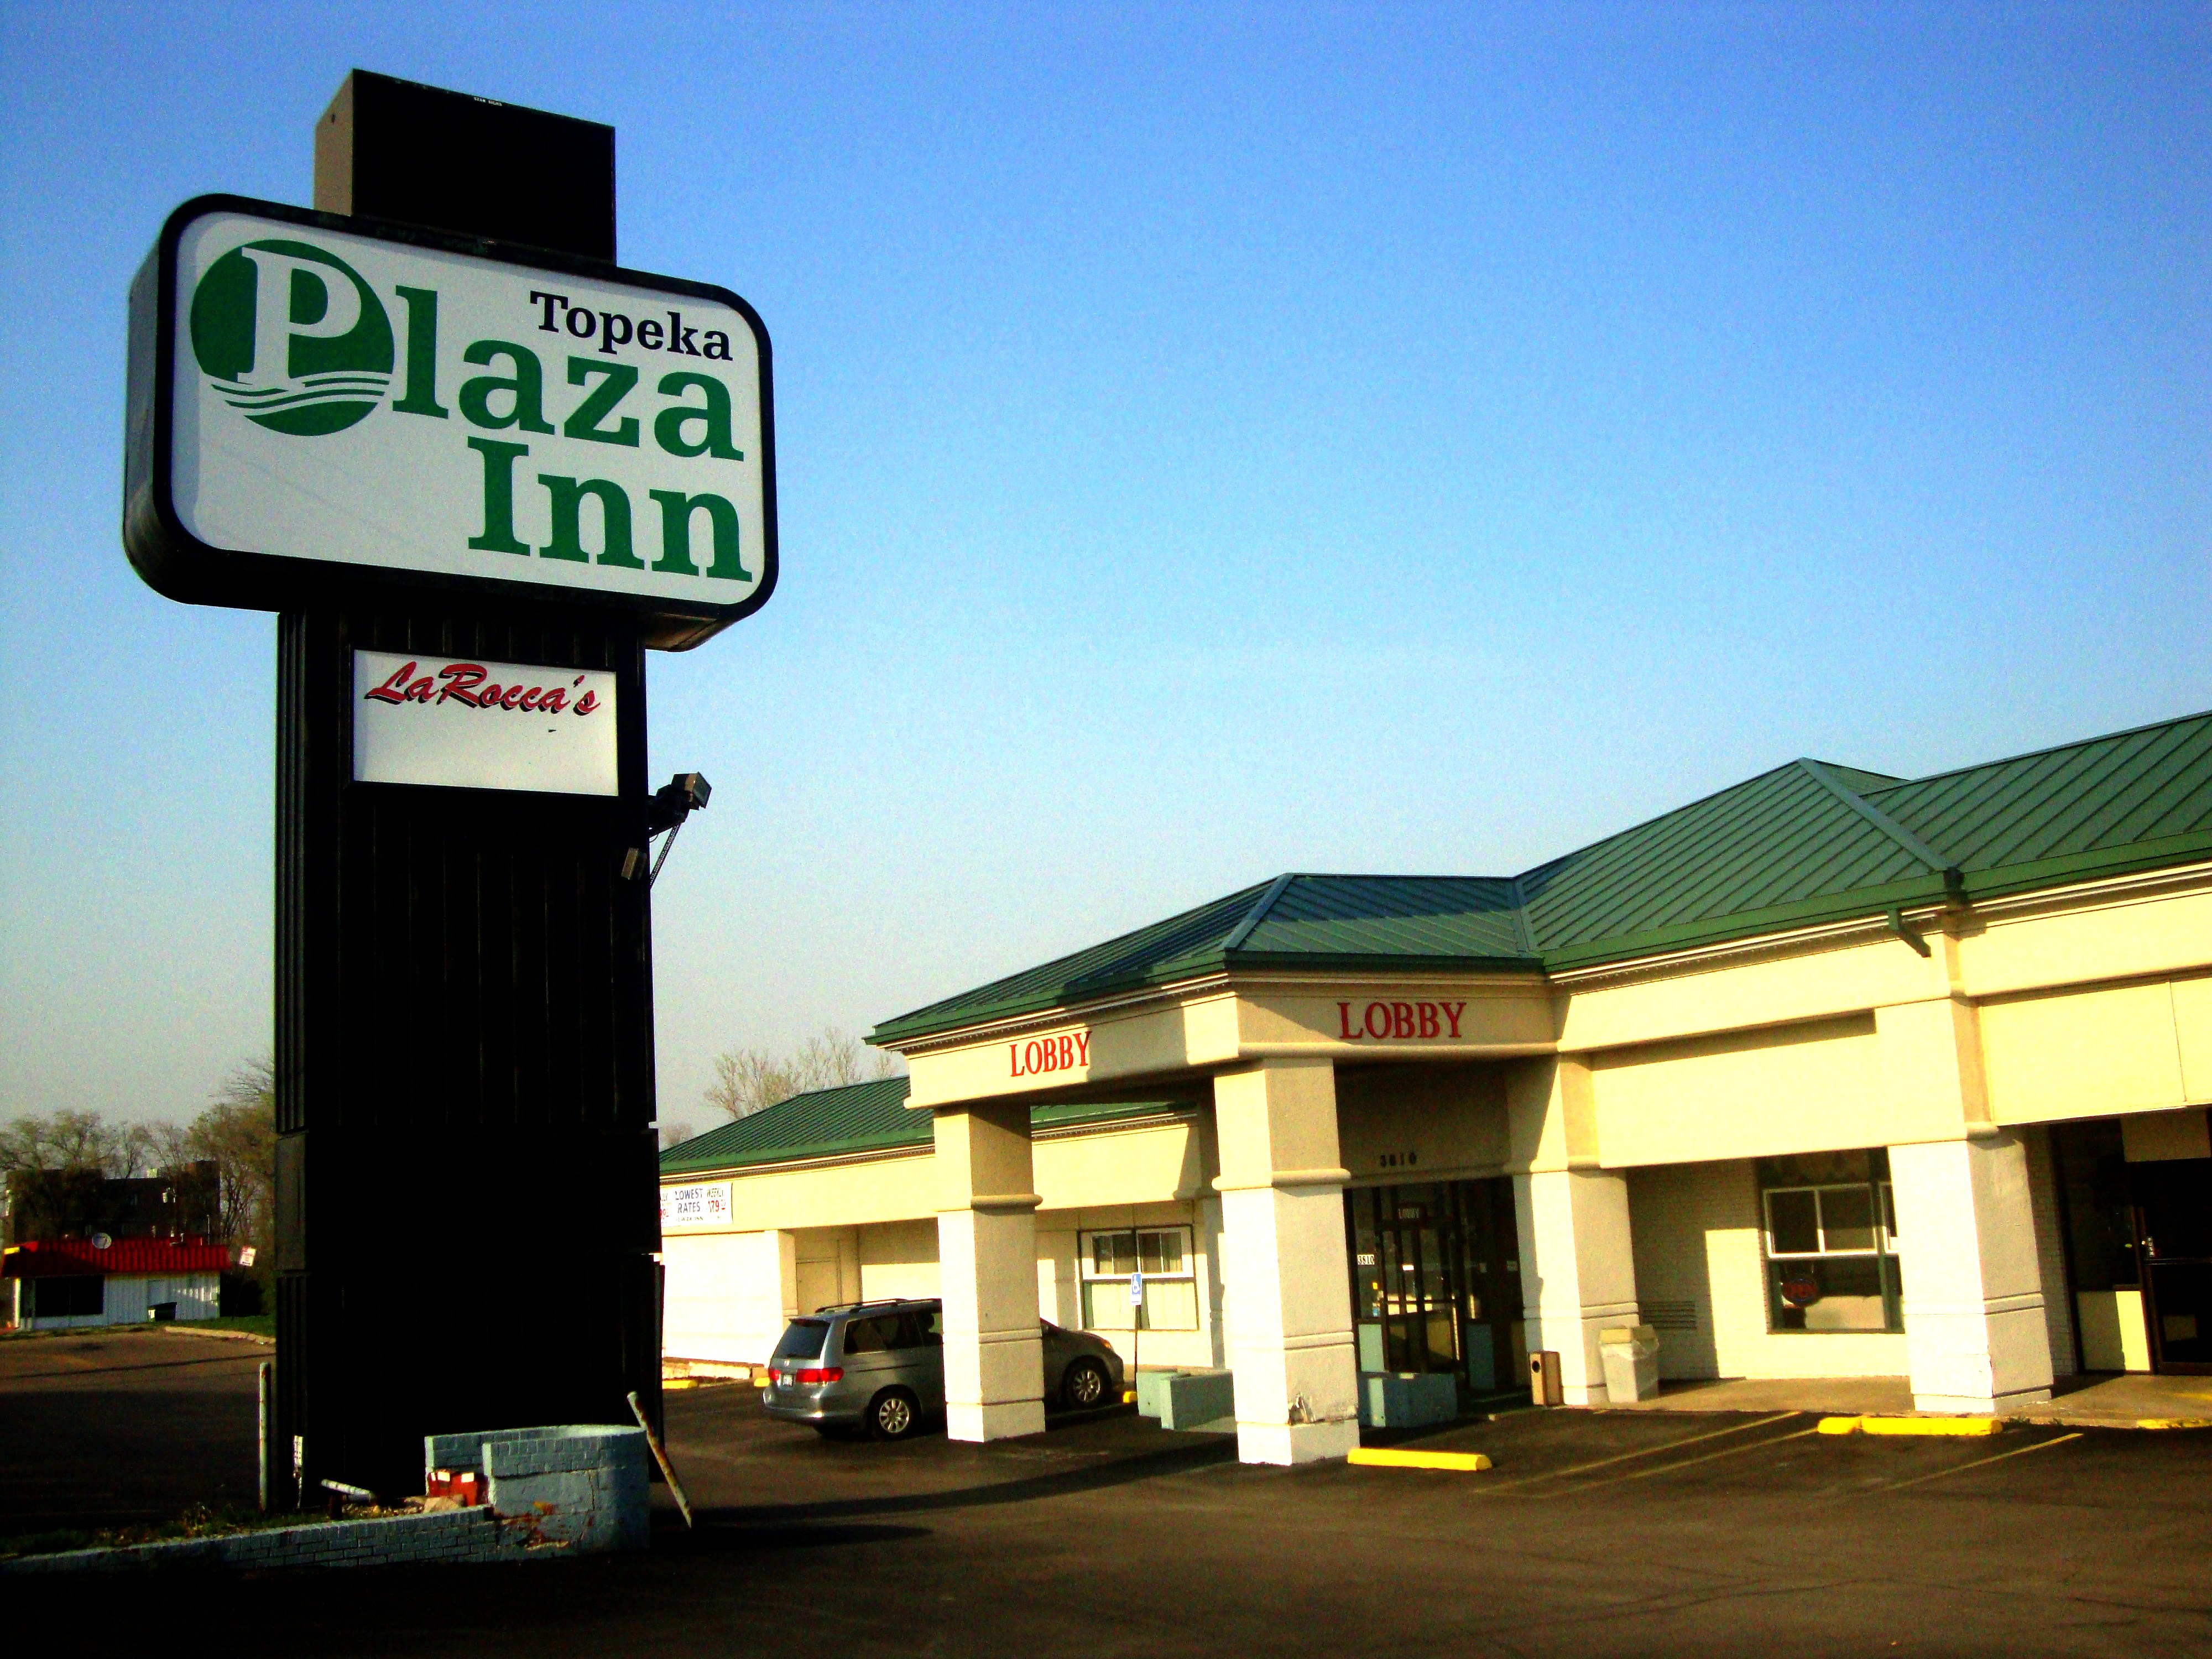 Plaza Inn Hotel Topeka Ks